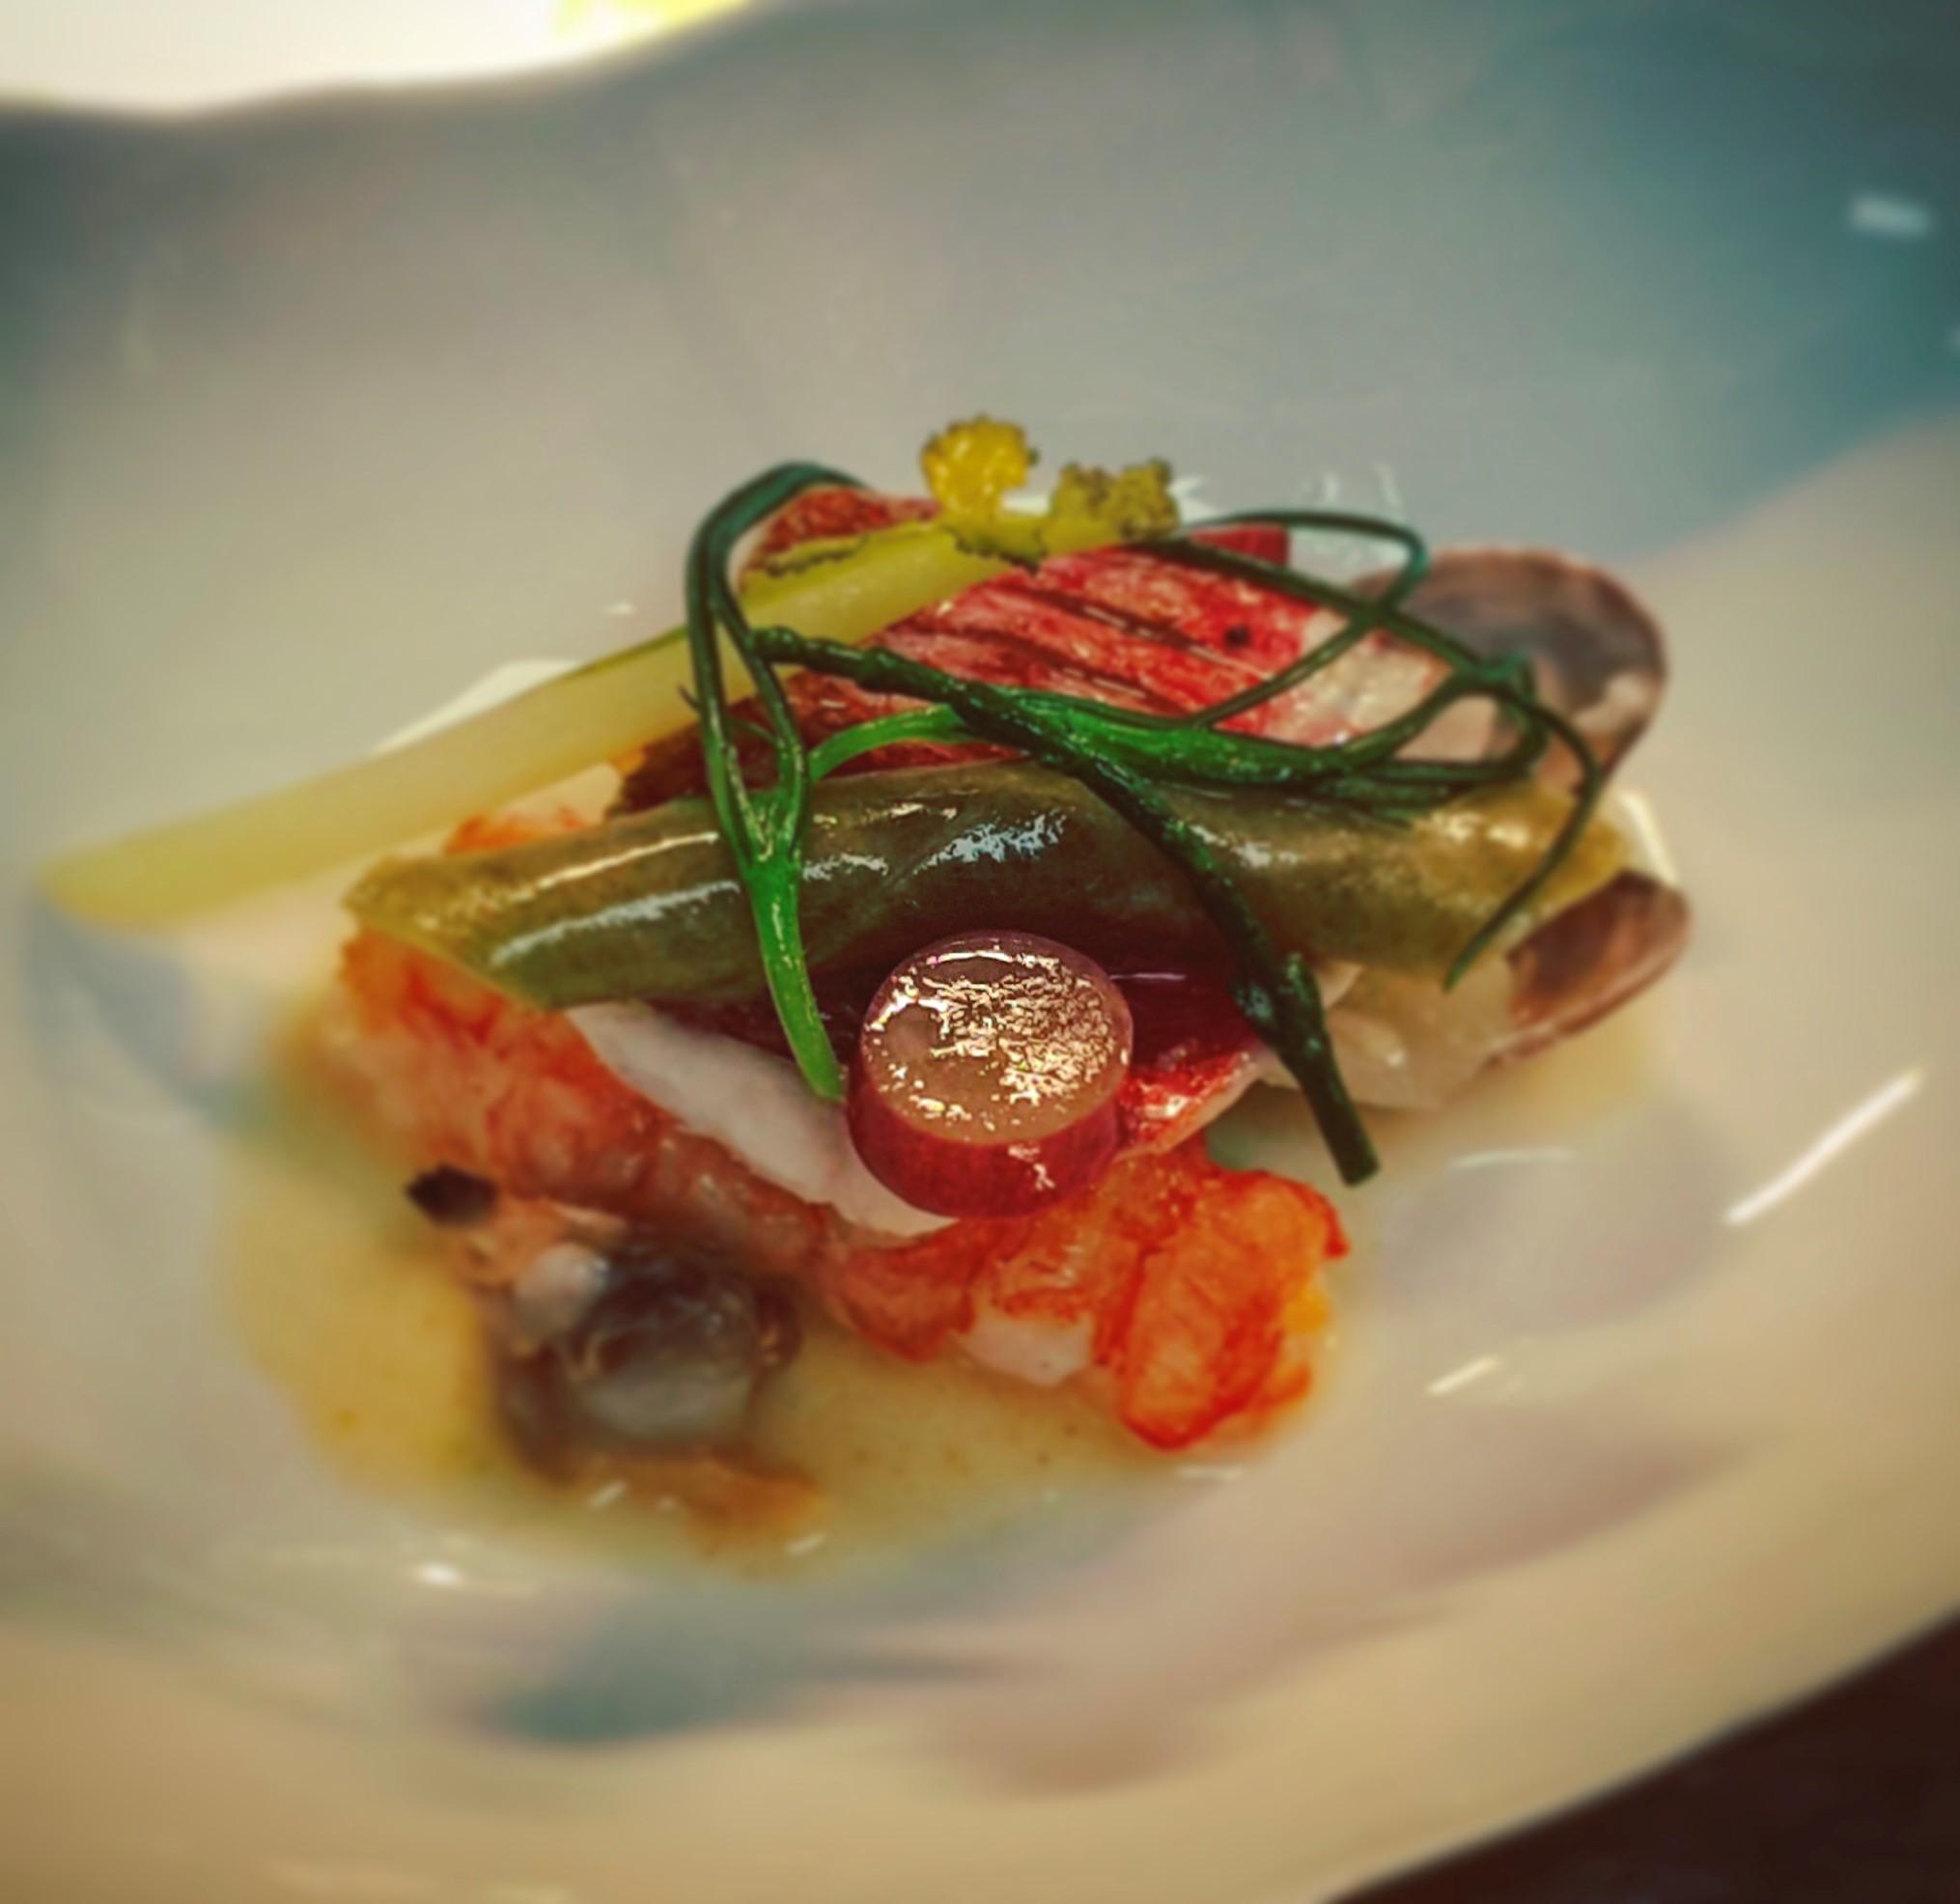 Grilled red mullet, sea vegetable, shellfish, verjus butter by chef Dean Westcar, Restaurant Hywel Jones by Lucknam Park